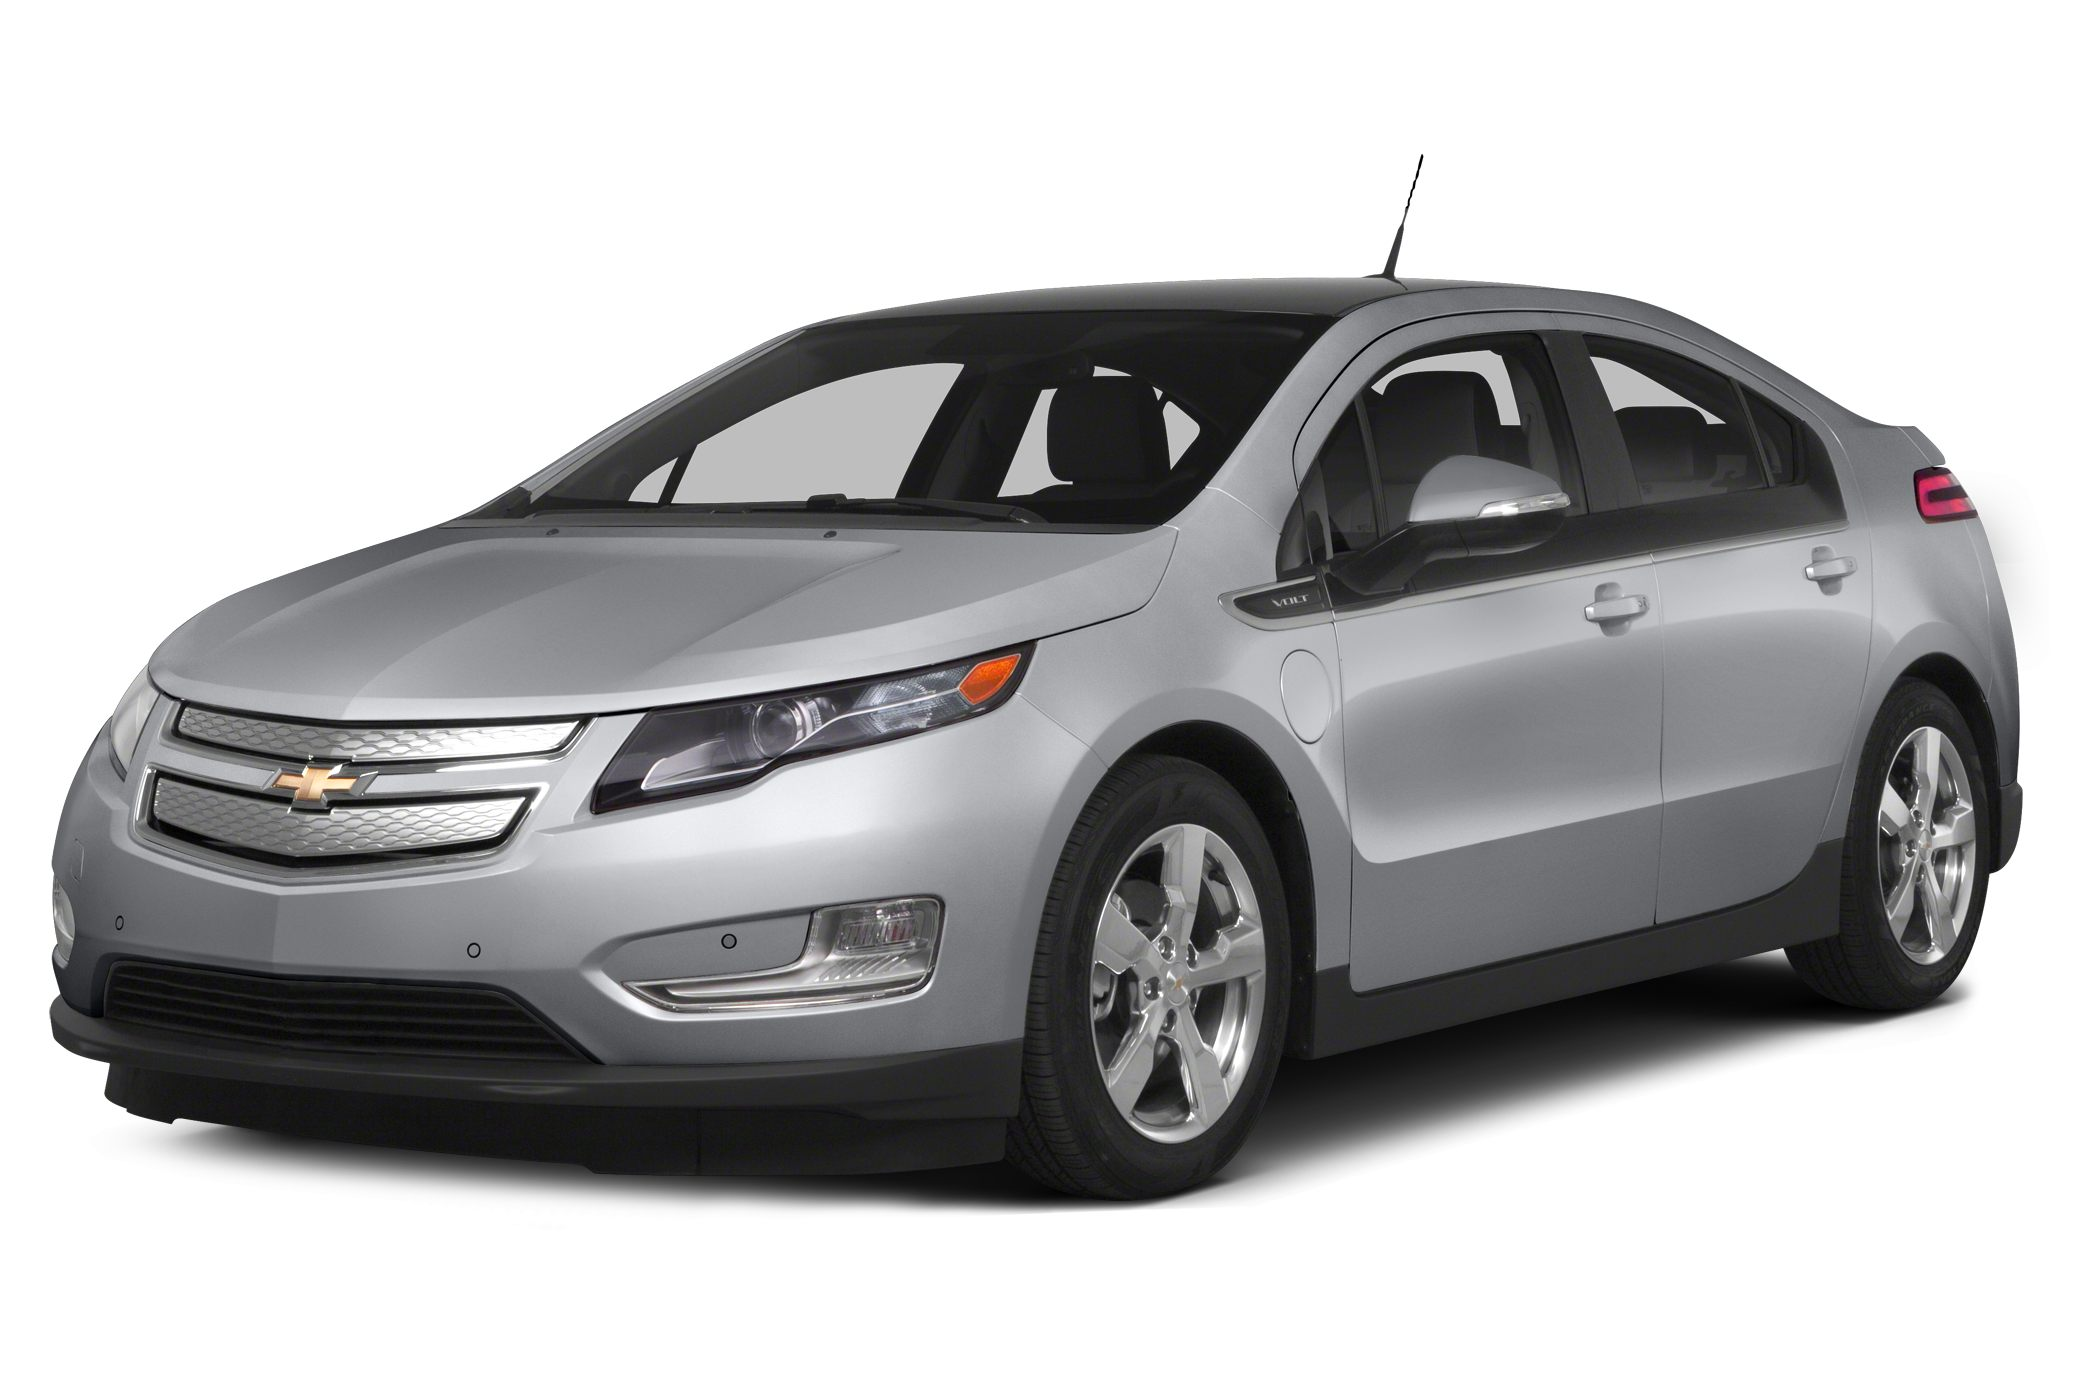 2015 Chevrolet Volt Information